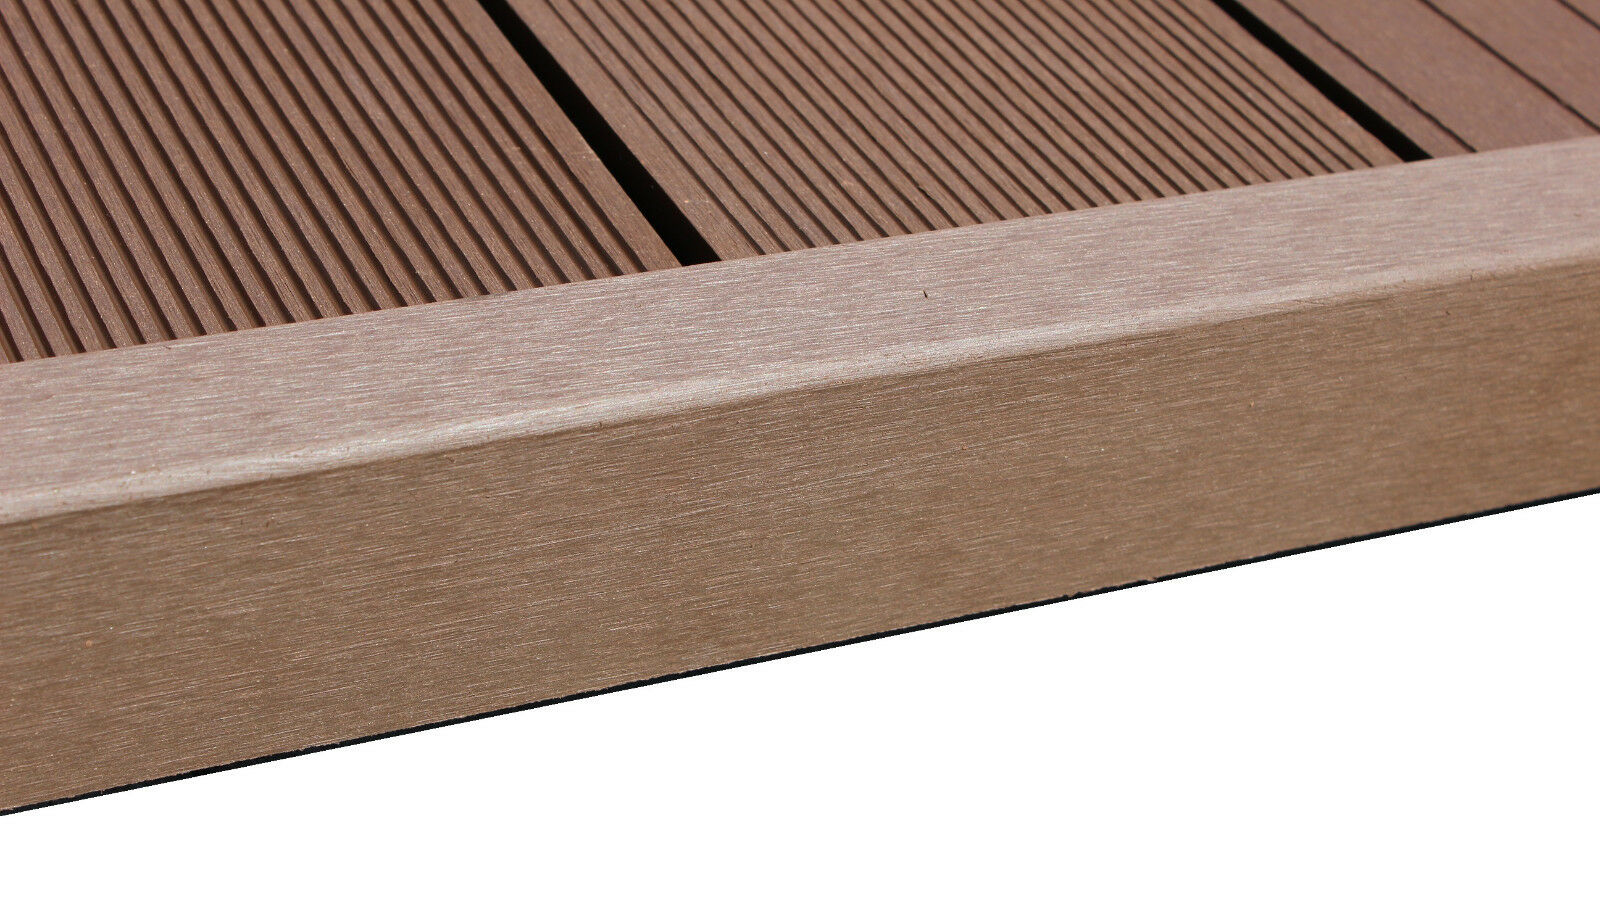 MUSTER WPC L Winkel Abschlussleiste Terrassendielen Grau Co-Extrudiert 15x5x5 cm